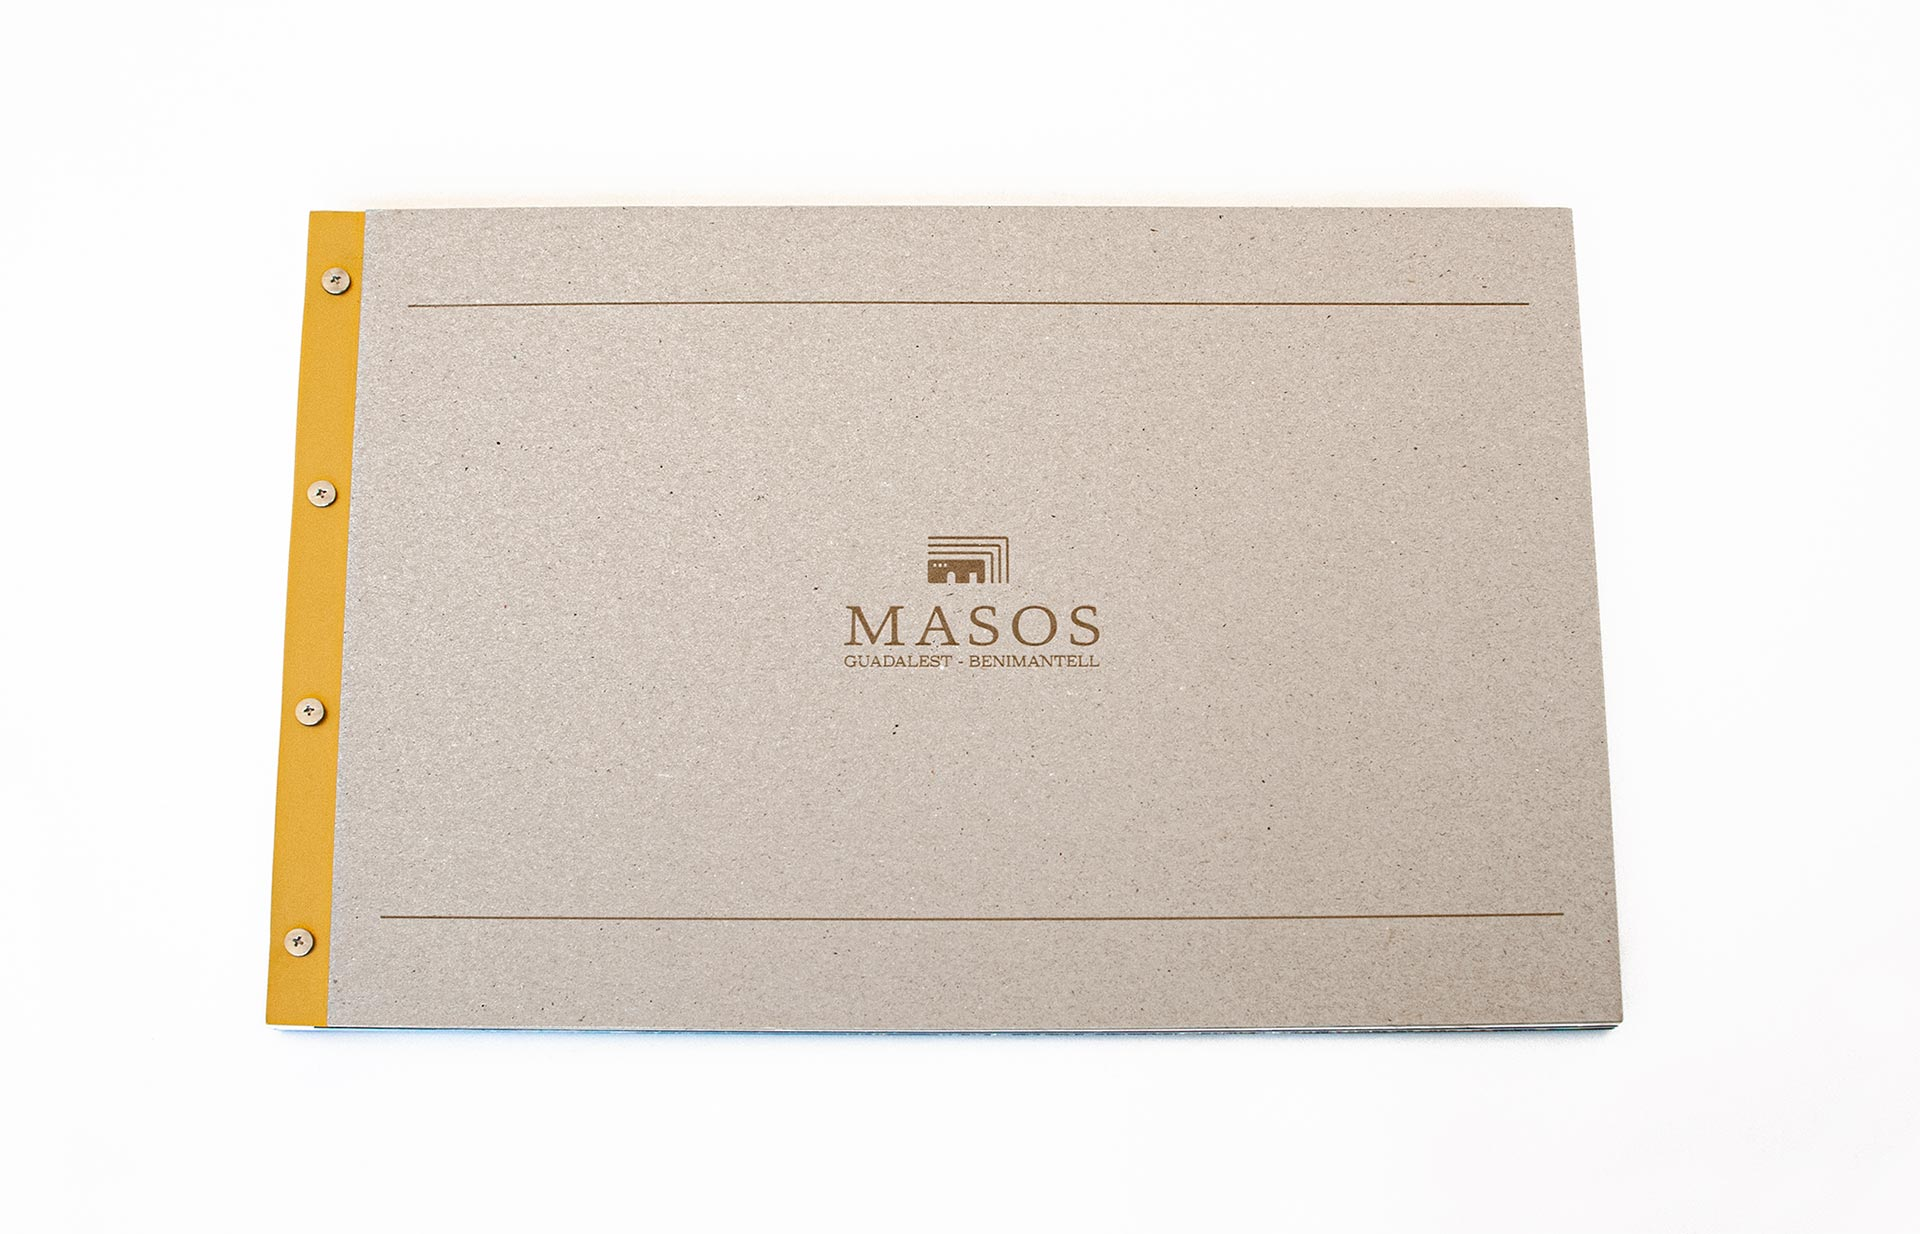 giset design masos logo y identidad corporativa libro